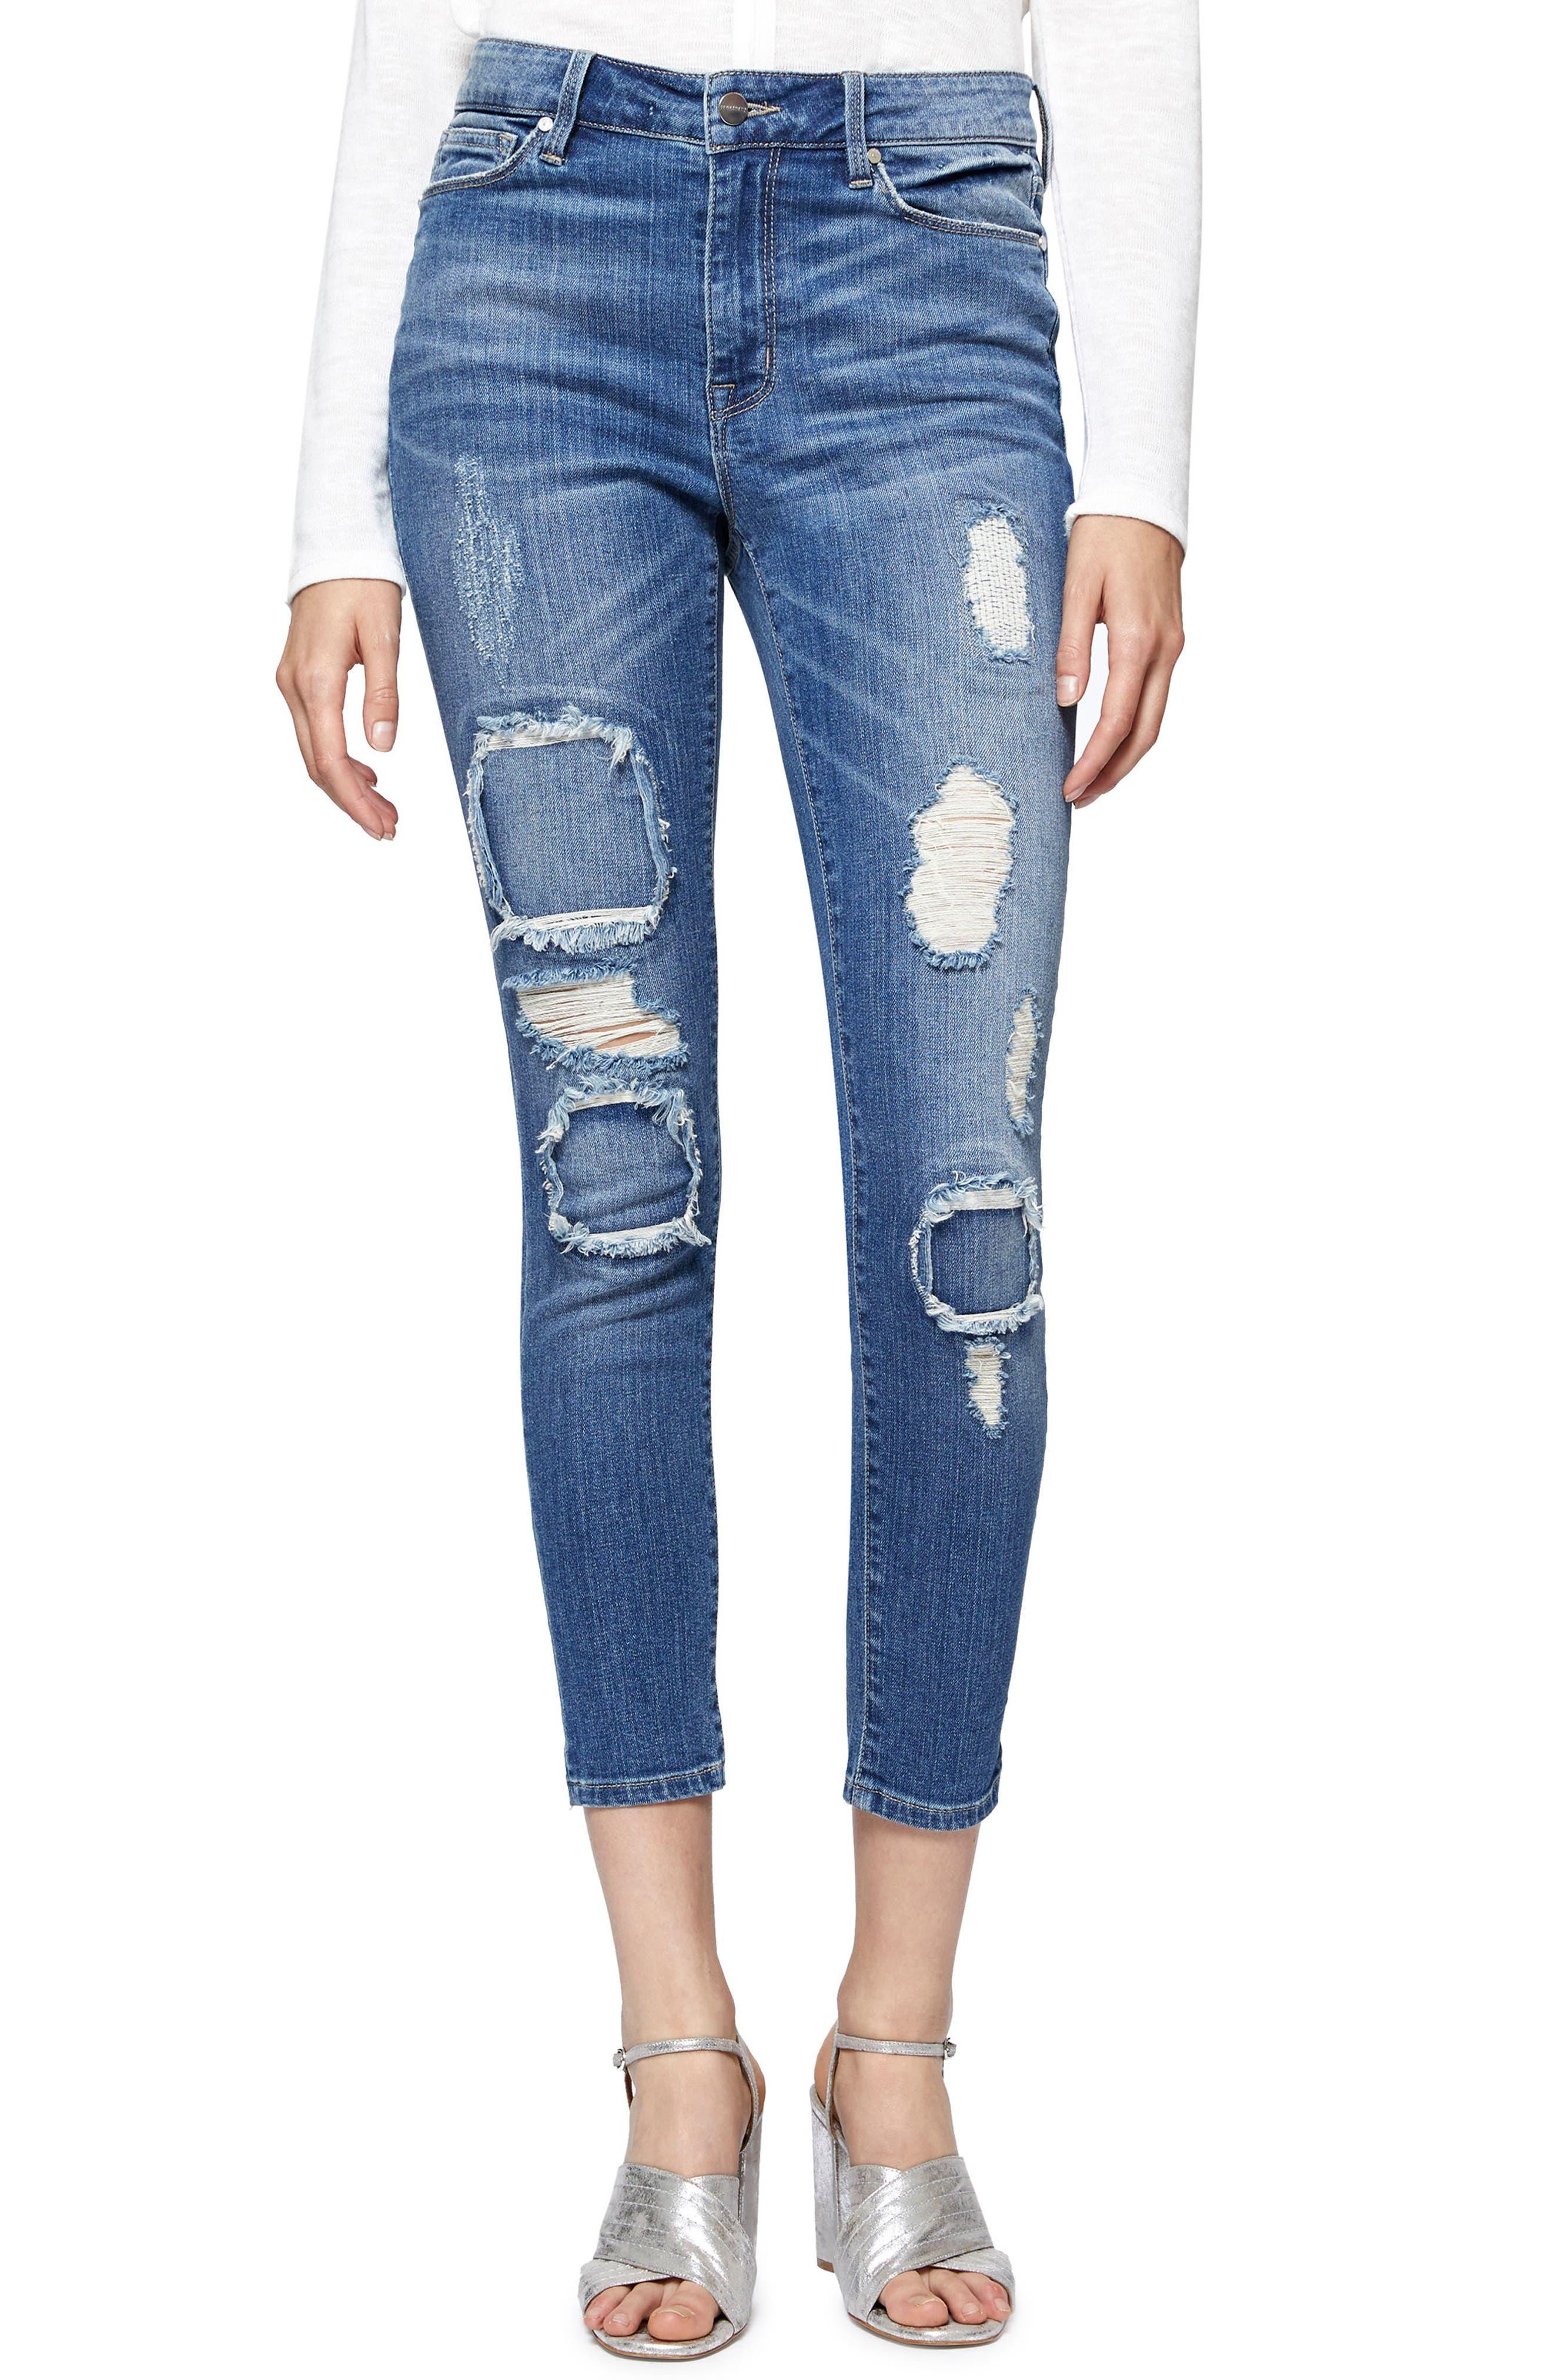 Alternate Image 1 Selected - Sanctuary Robbie Rip & Repair Skinny Ankle Jeans (Taylor)